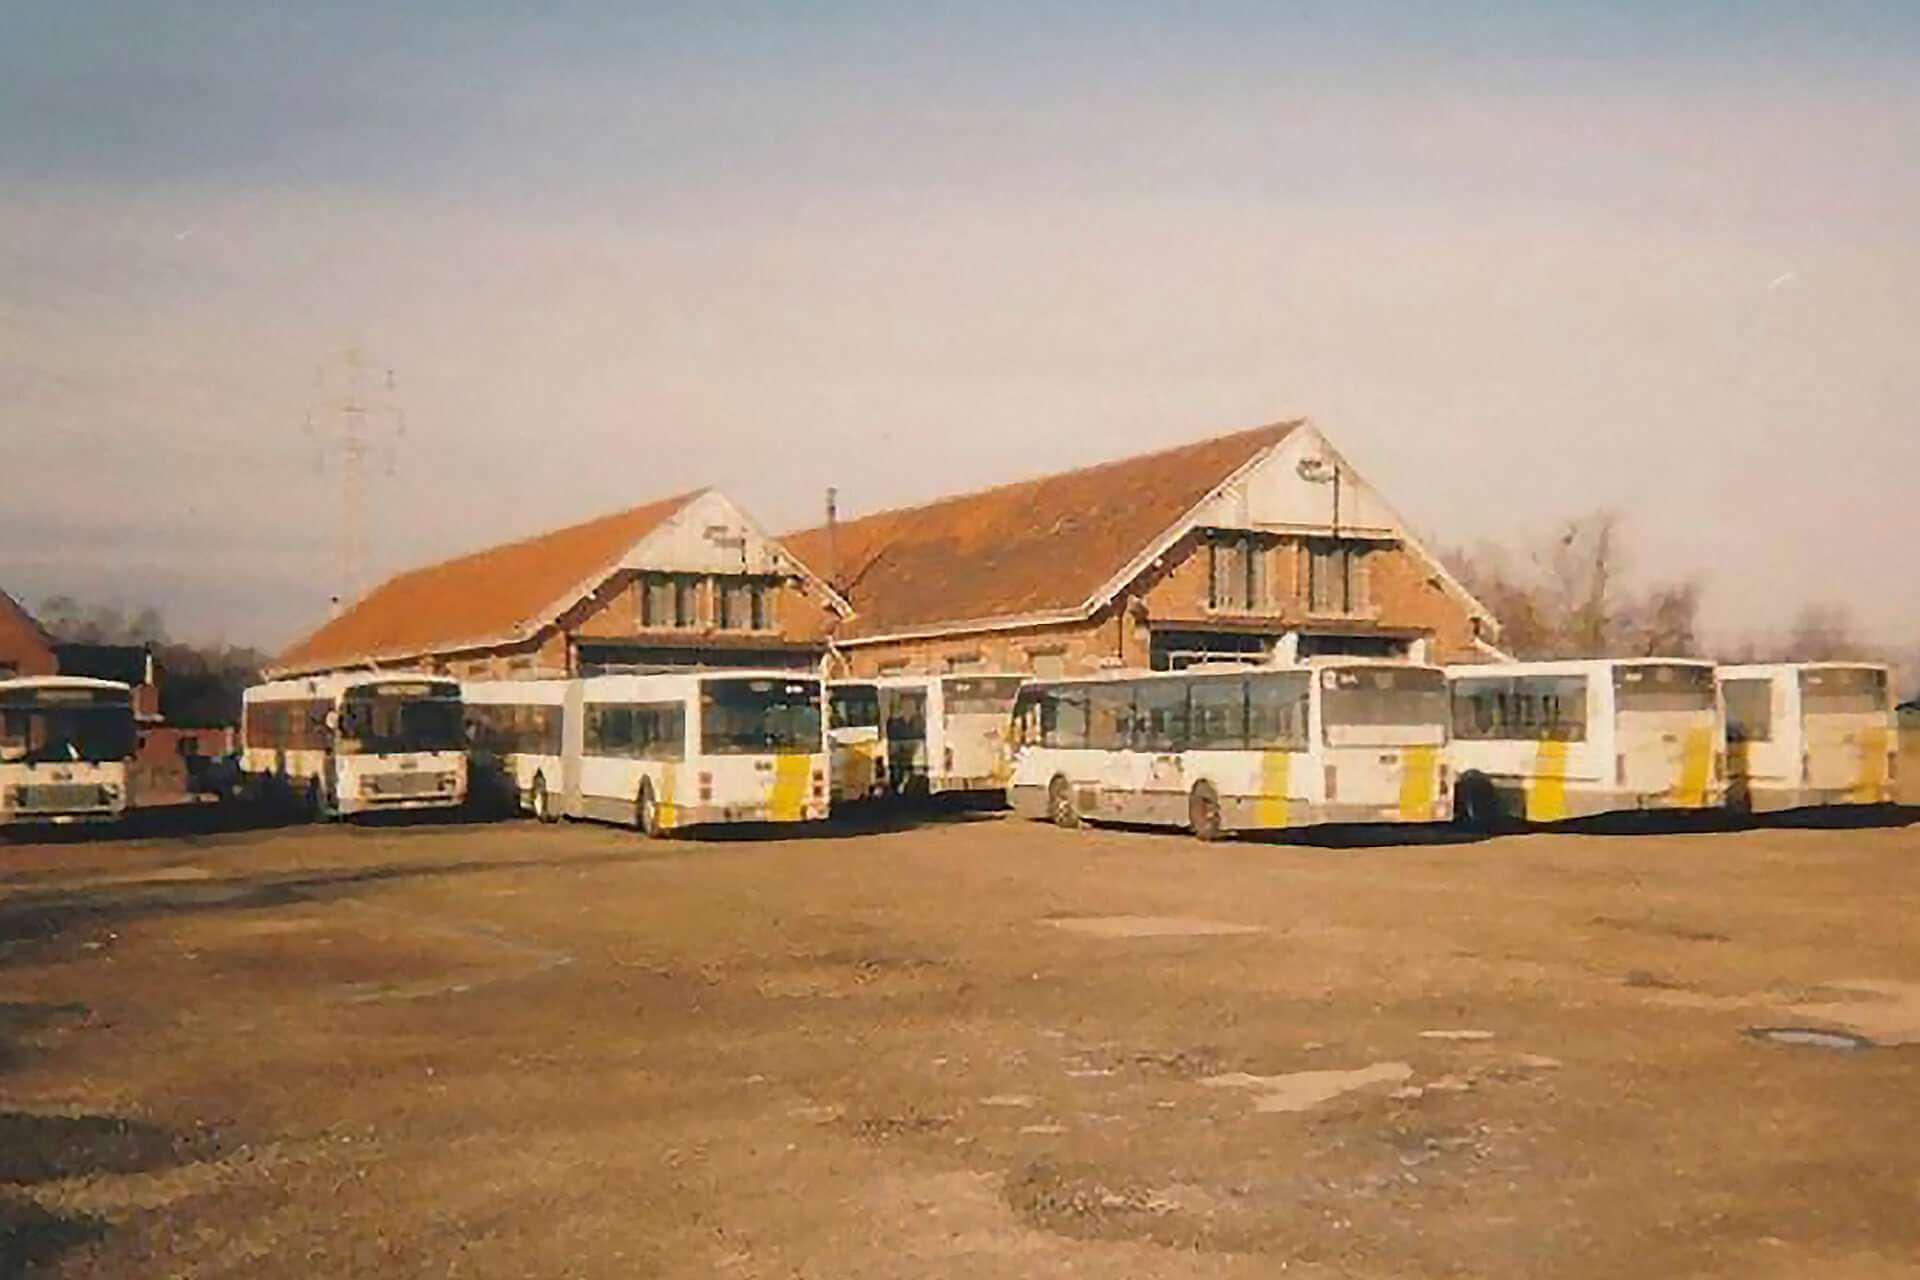 bus-stalling-koersel-bussen-lijn